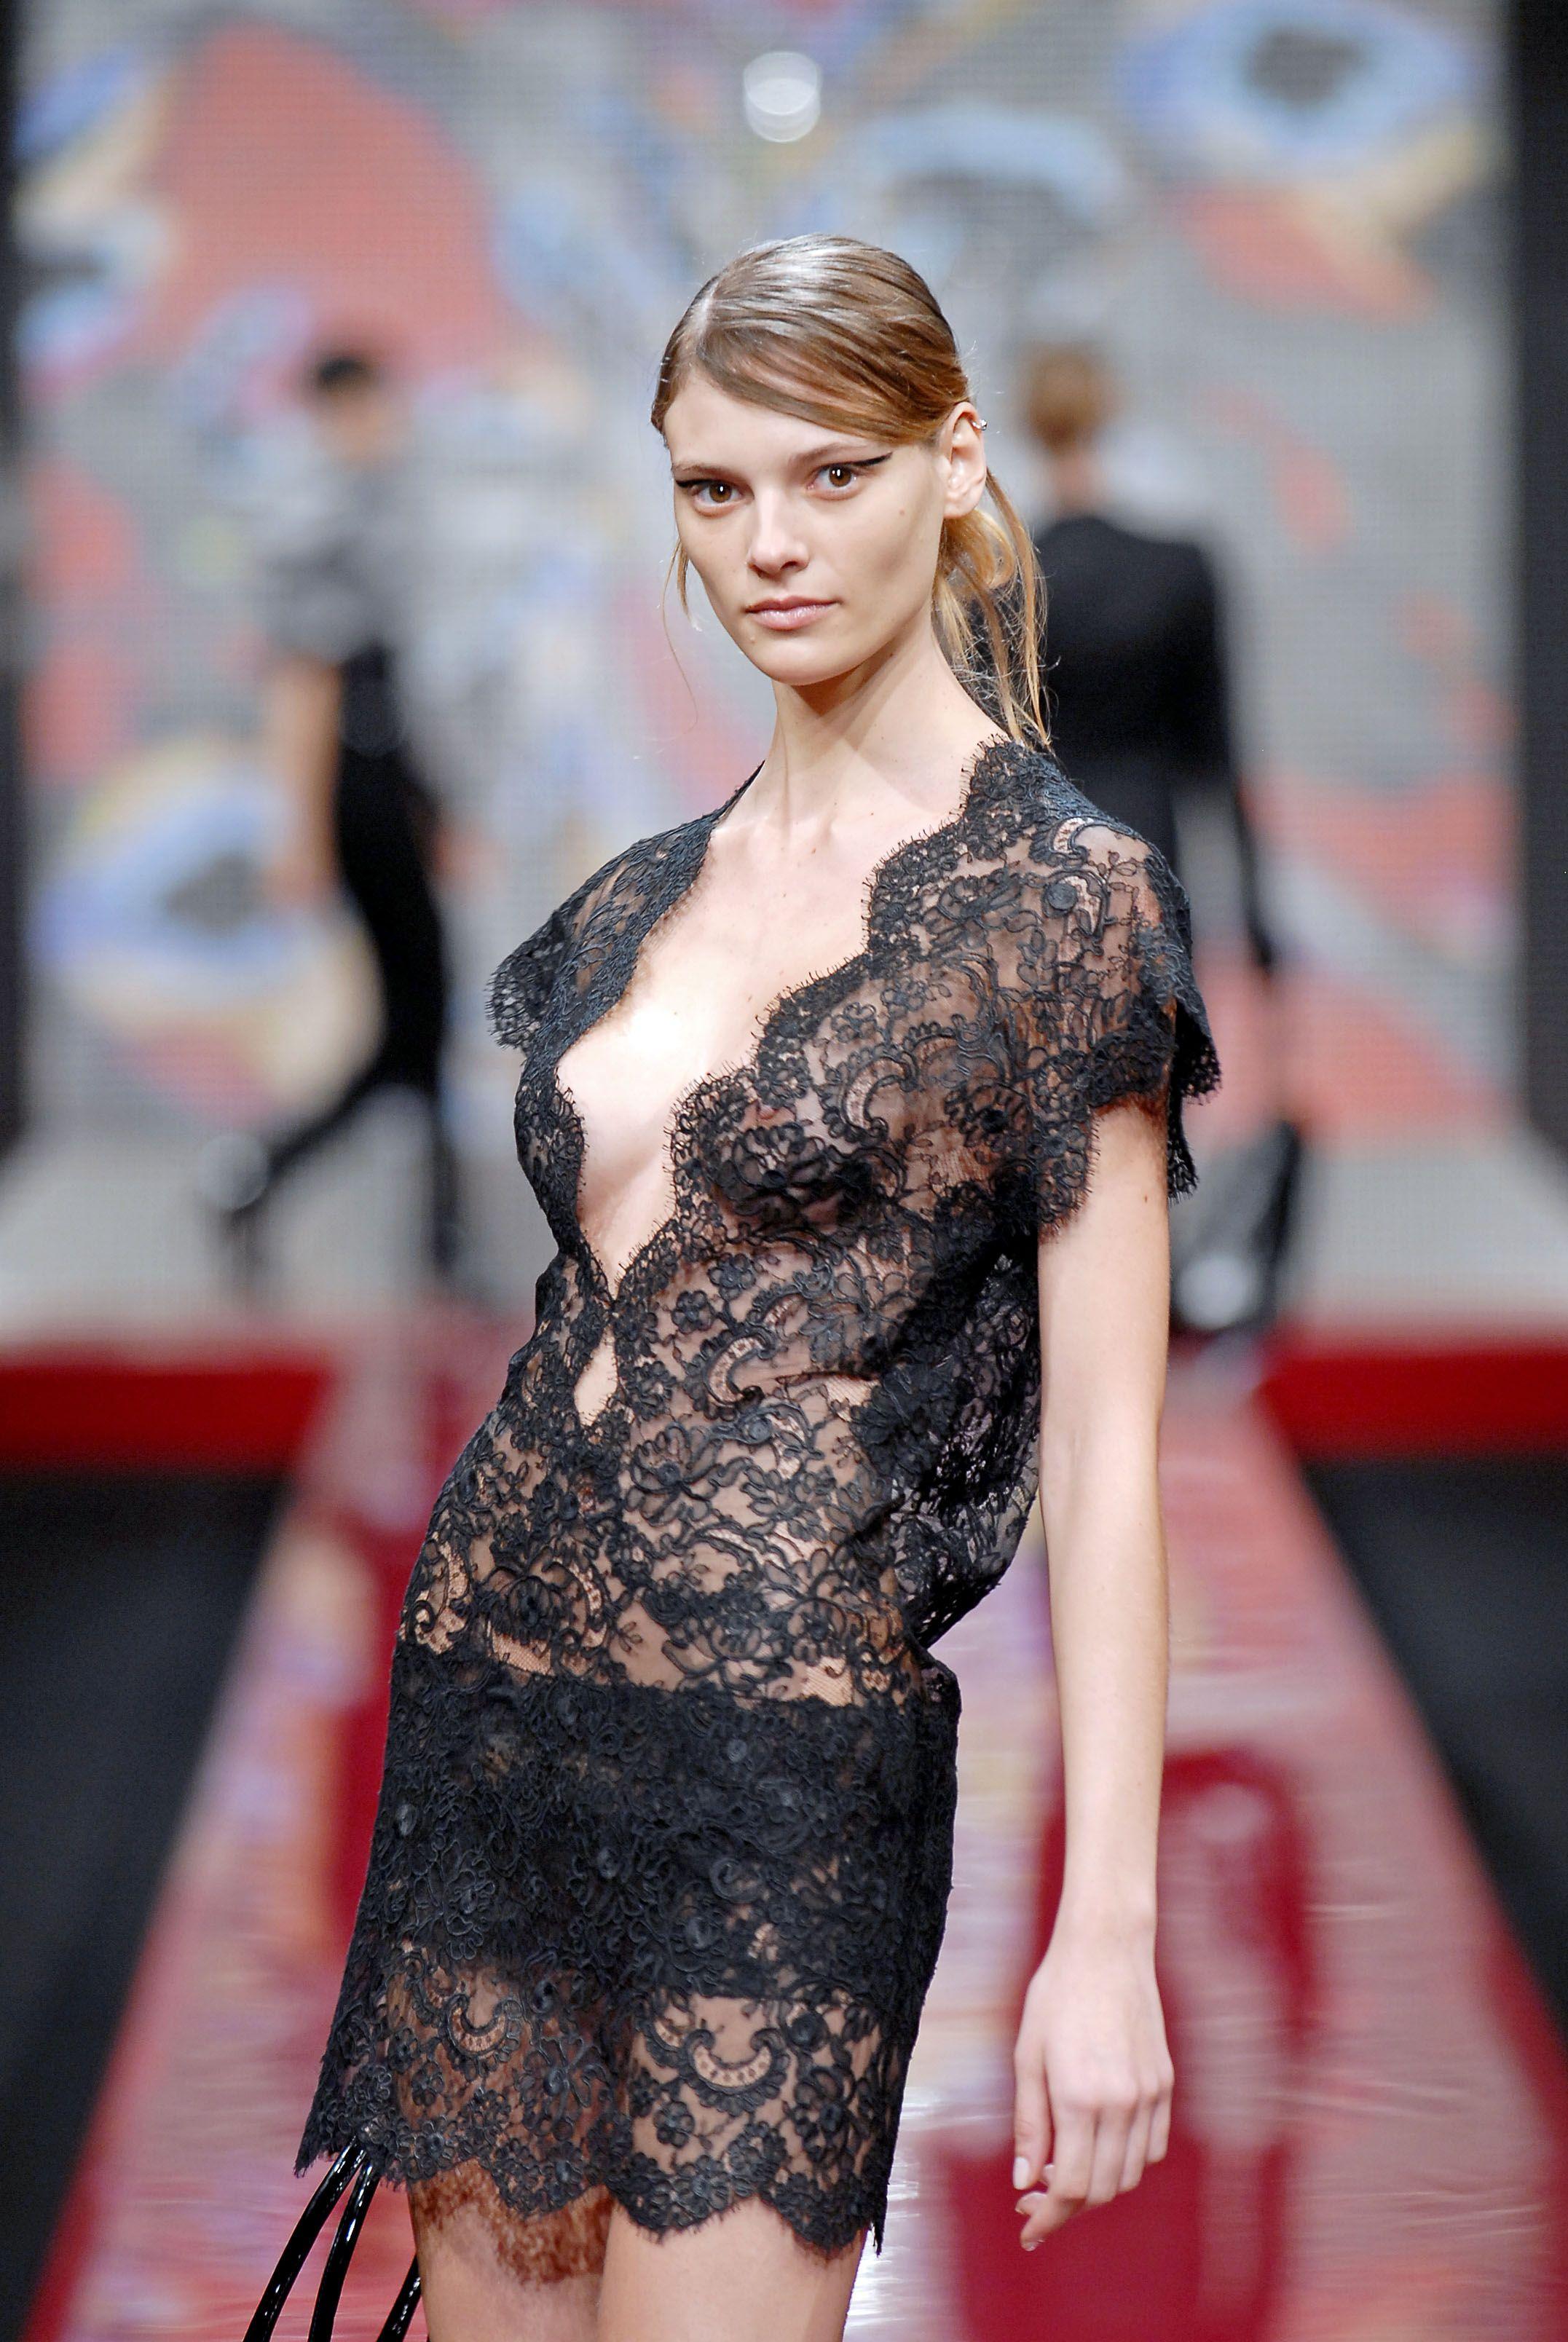 Brazilian Models, Picture Video, See Through, Catwalk, Public, Slip On,